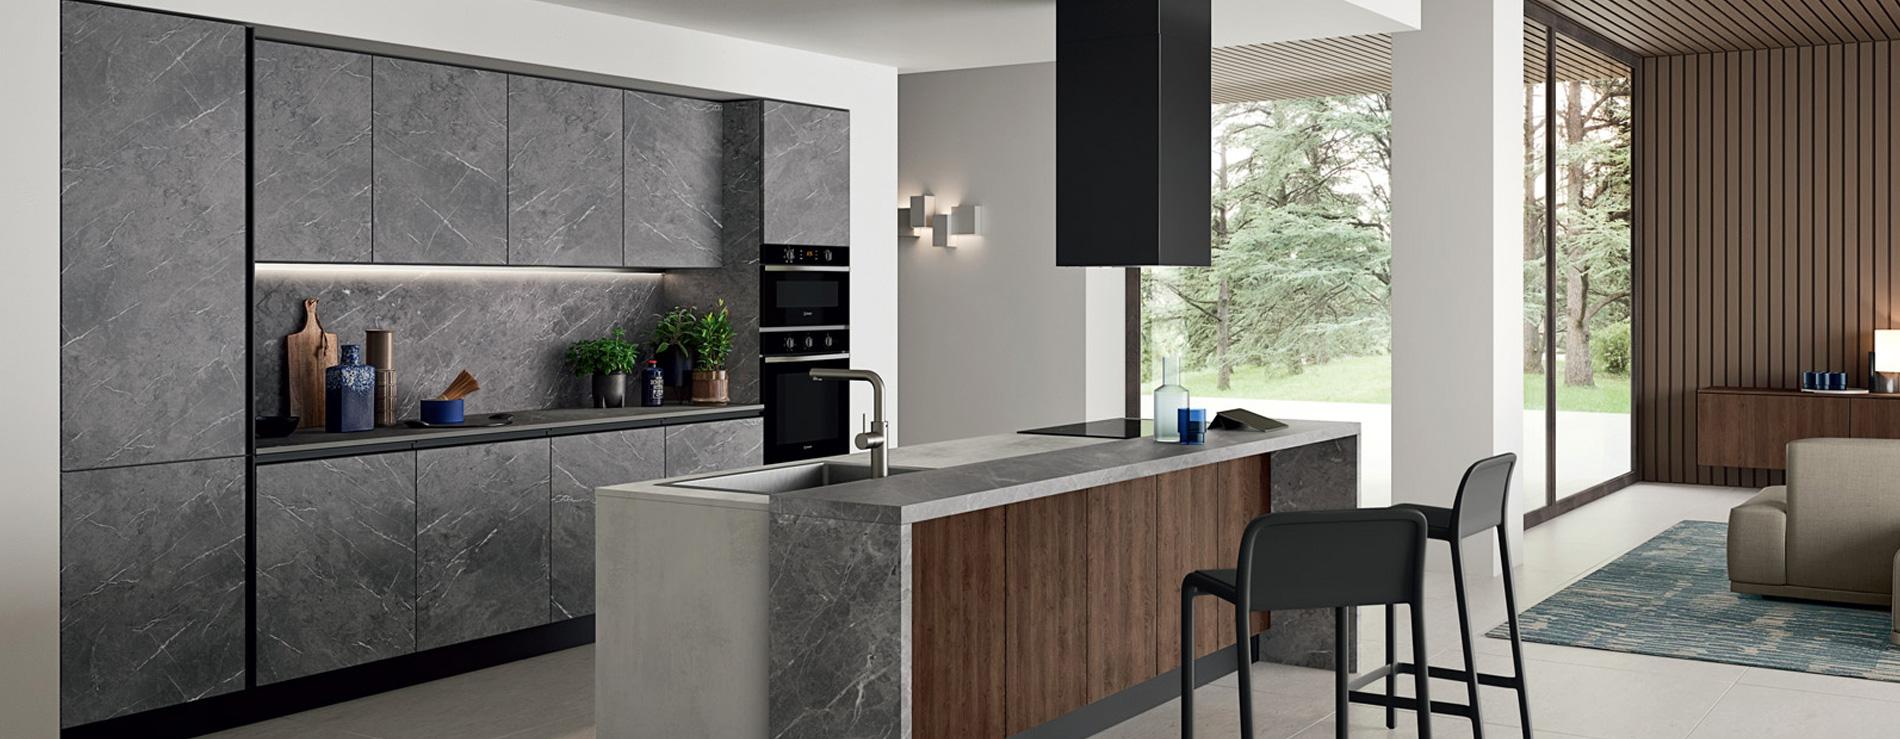 Cucina effetto marmo | AR-DUE